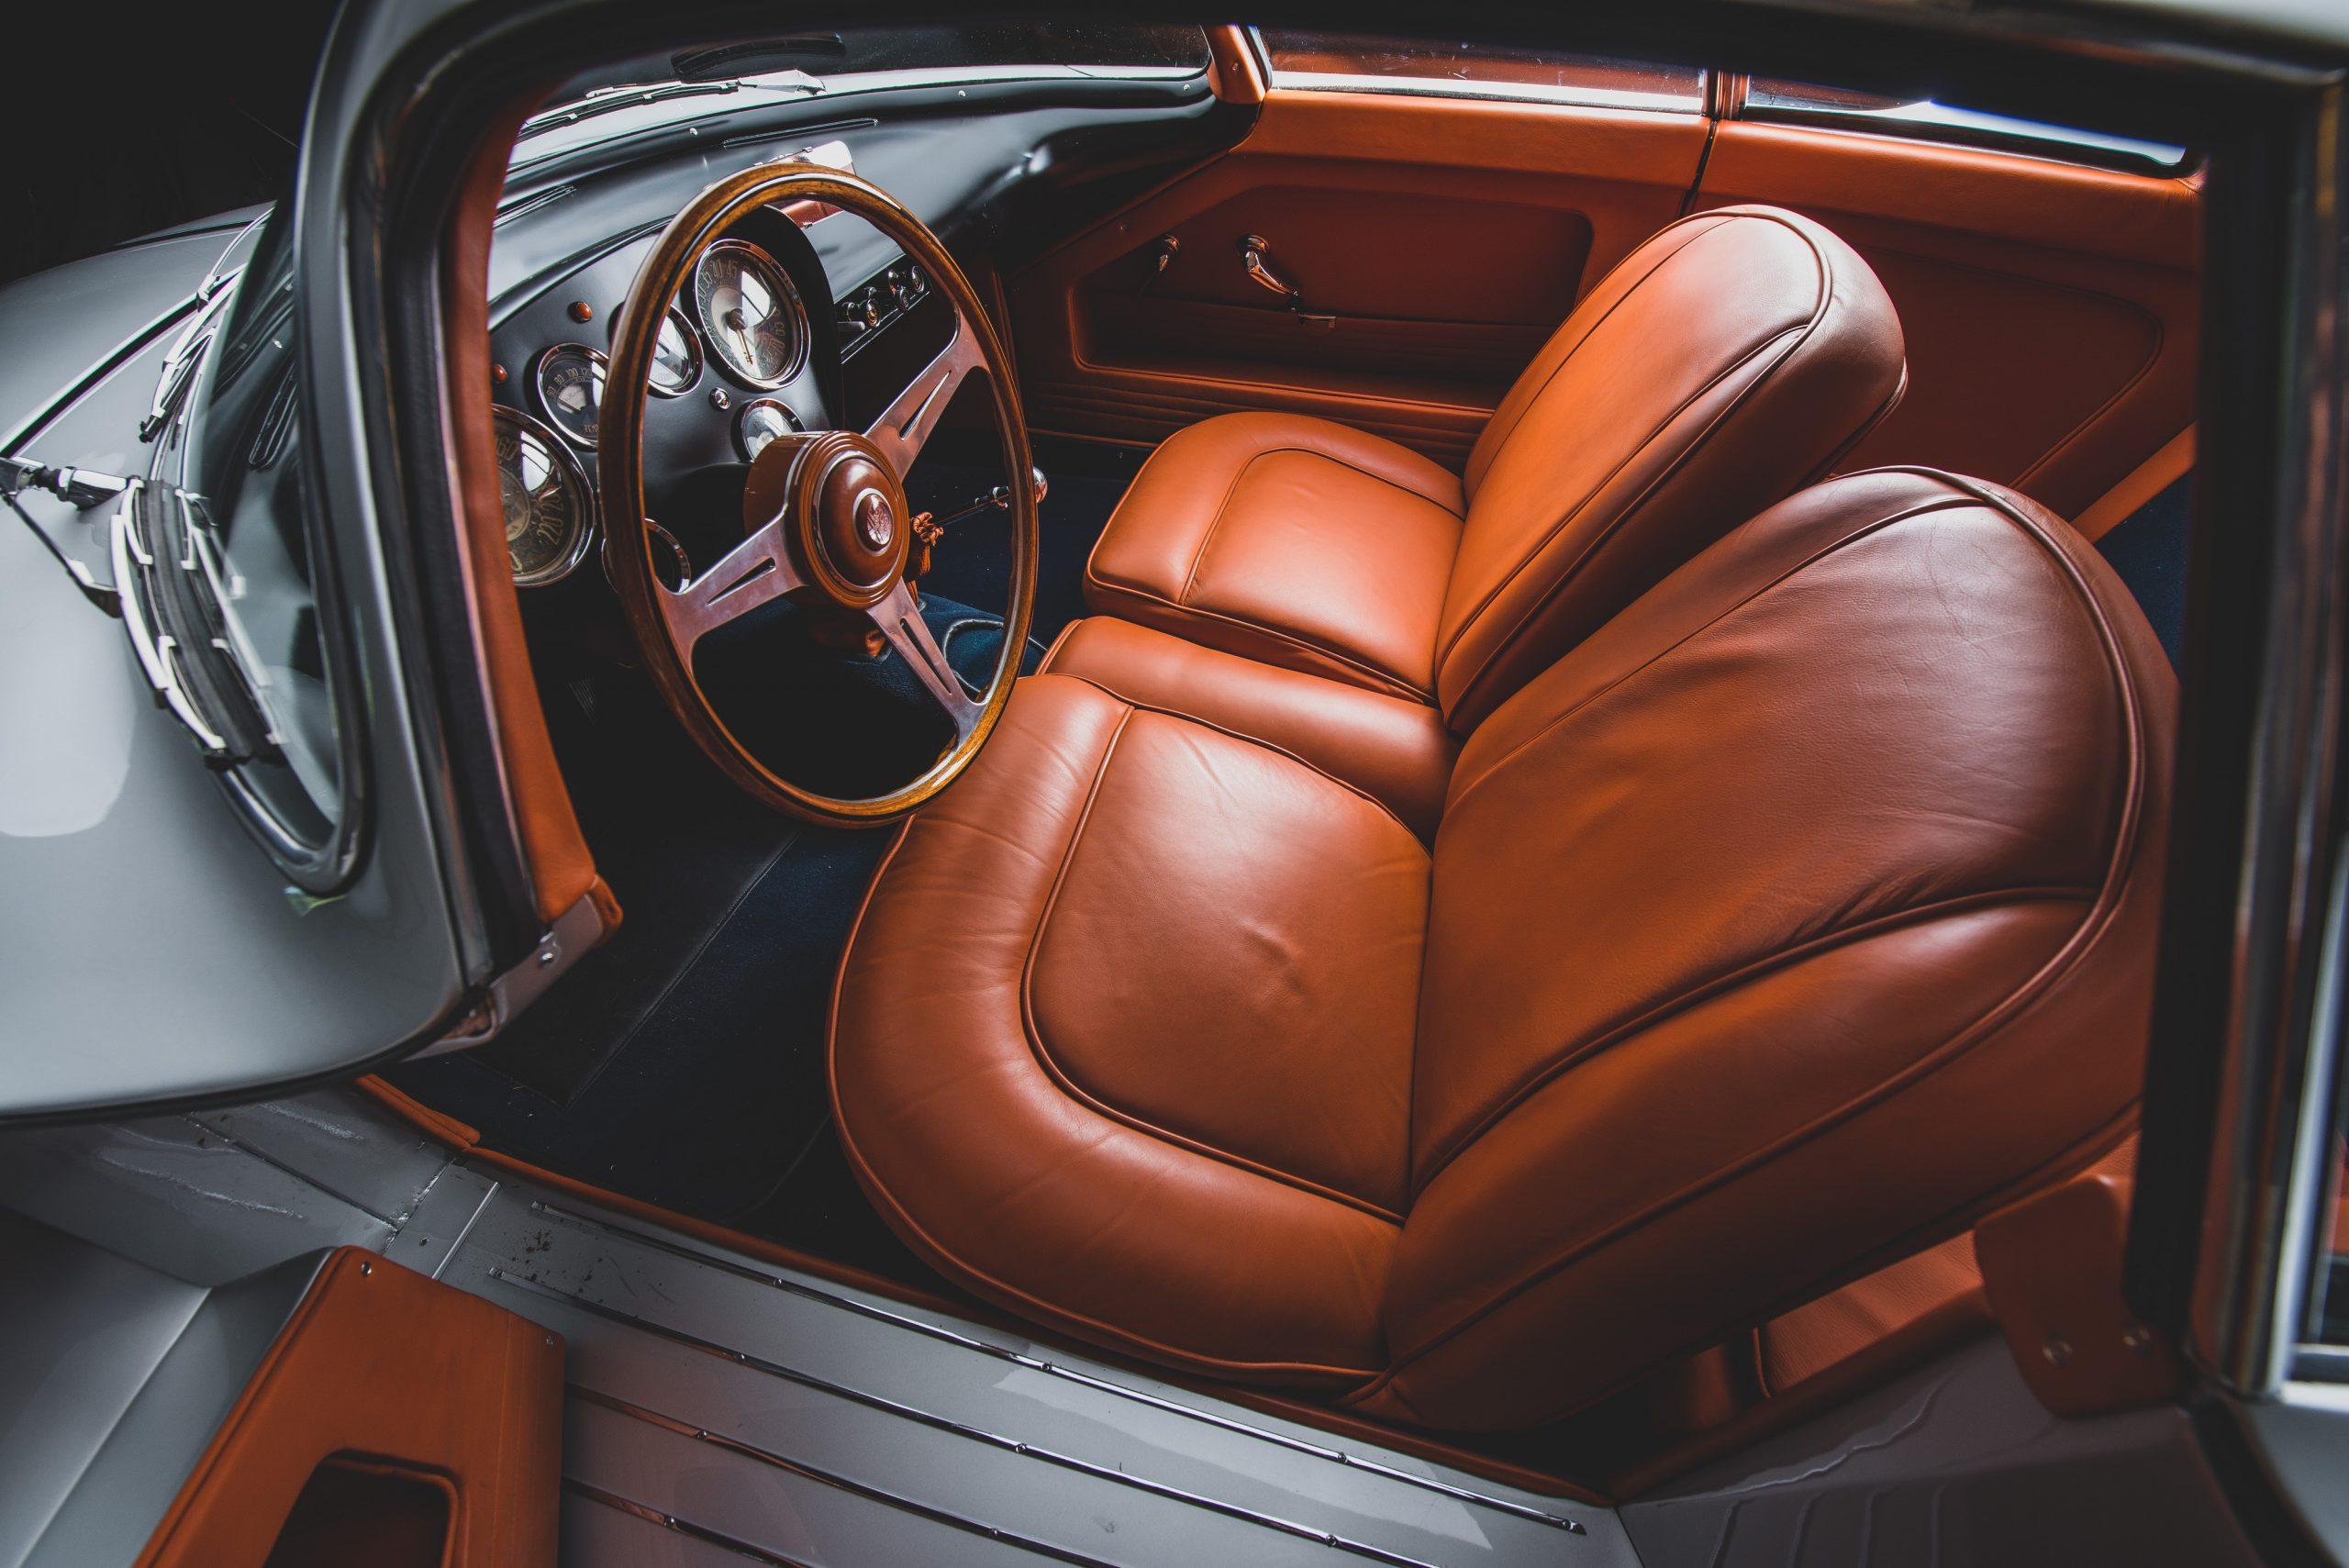 Alfa Romeo Berlina Aerodinamica Tecnica interior leather seats